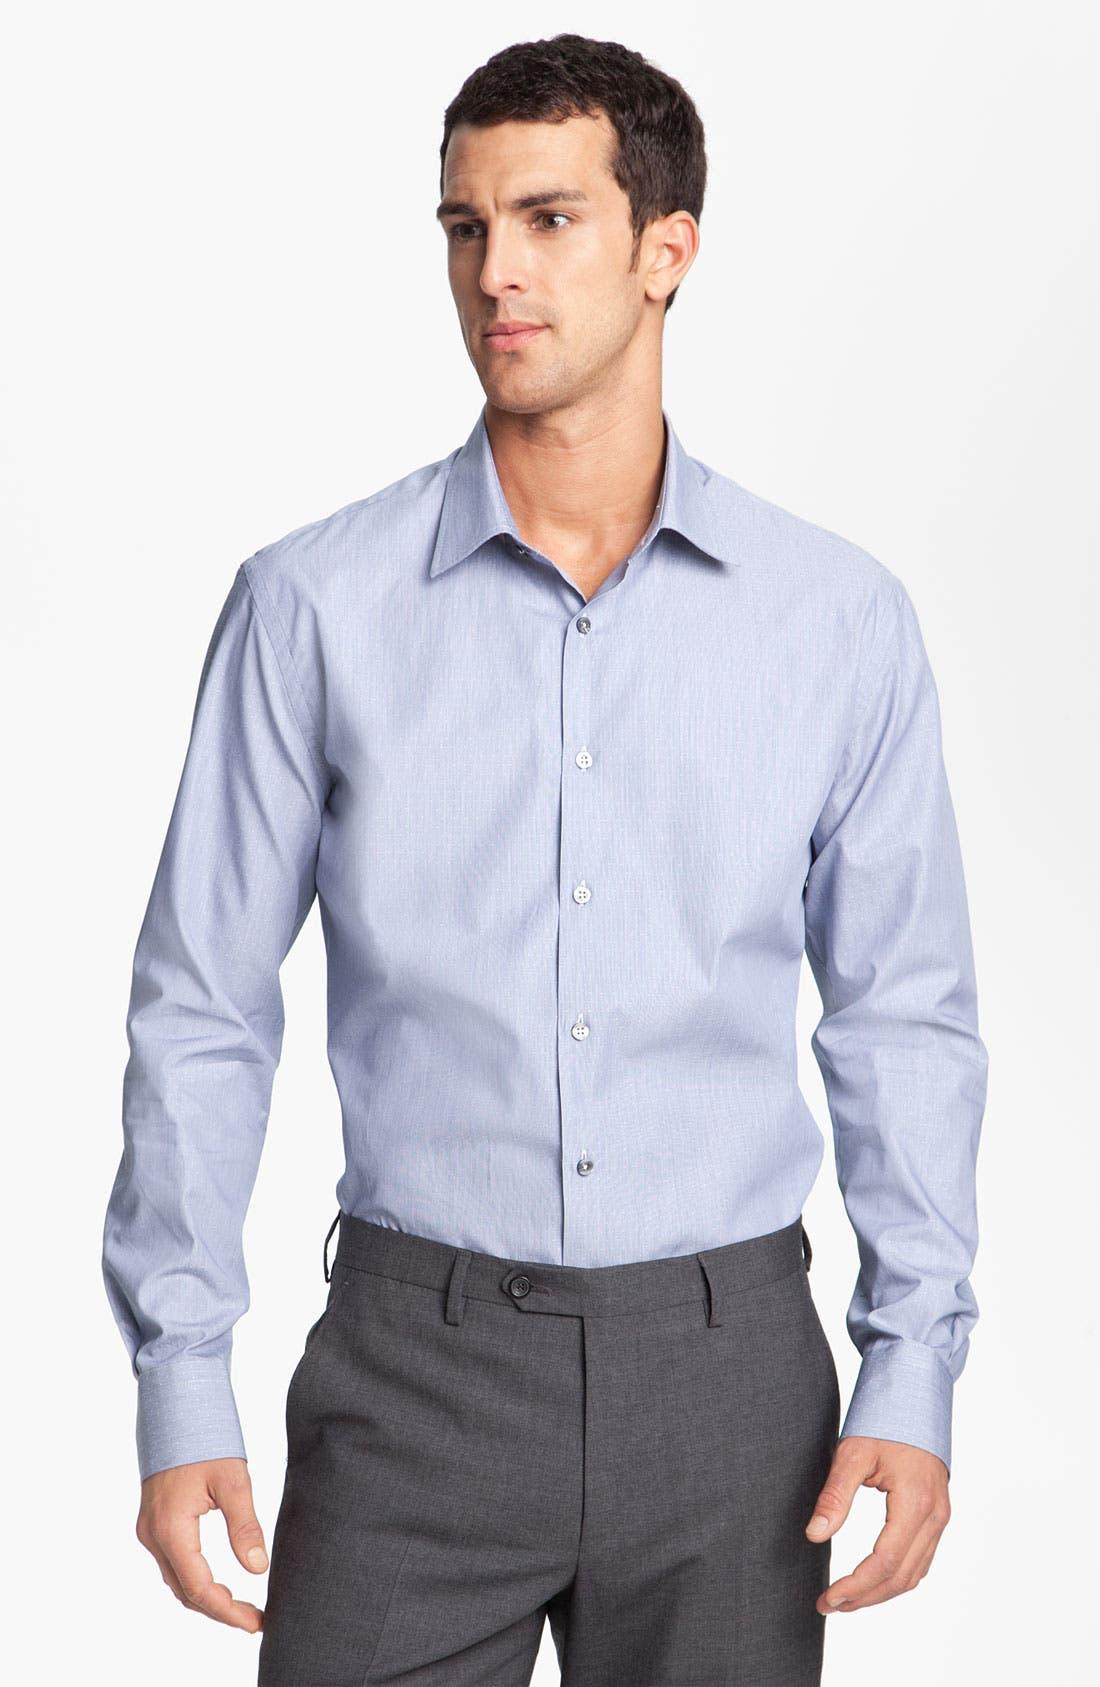 Alternate Image 1 Selected - Paul Smith London Microdot Dress Shirt